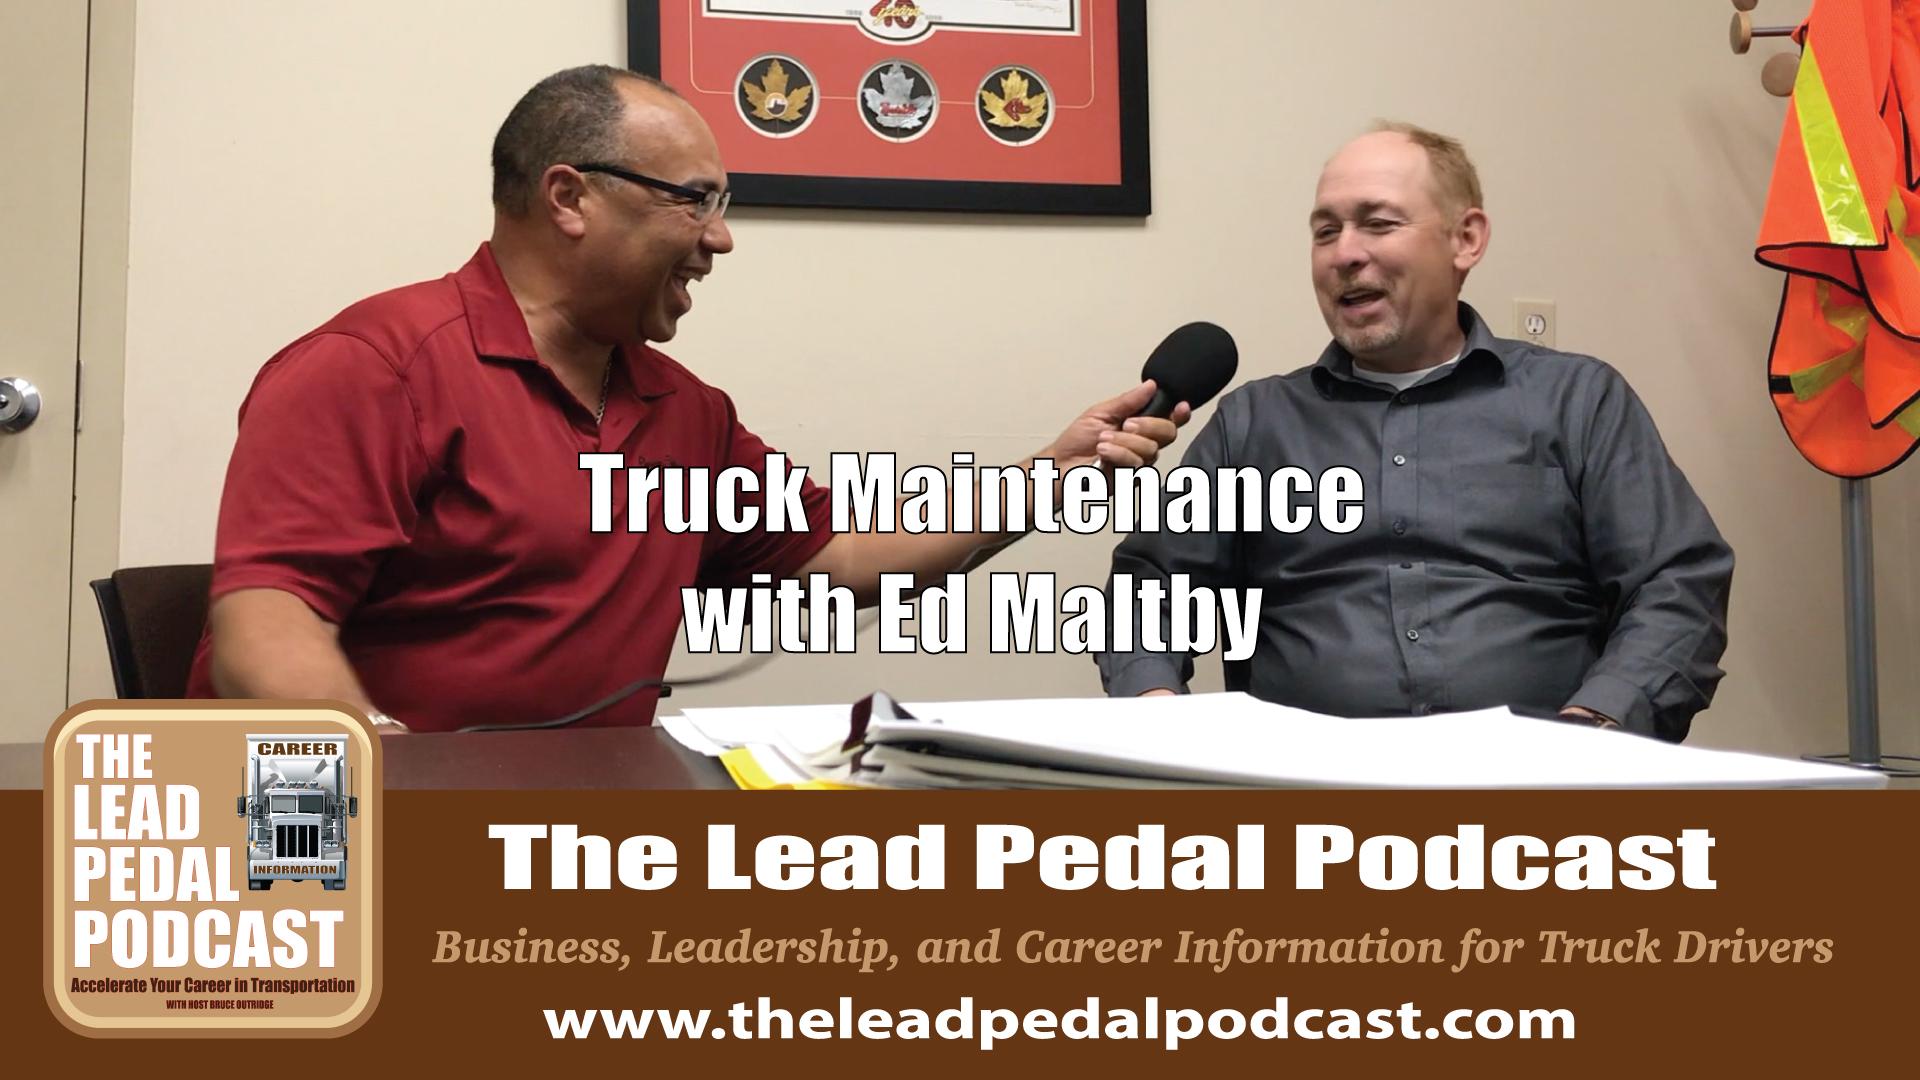 Ed maltby-maintenance